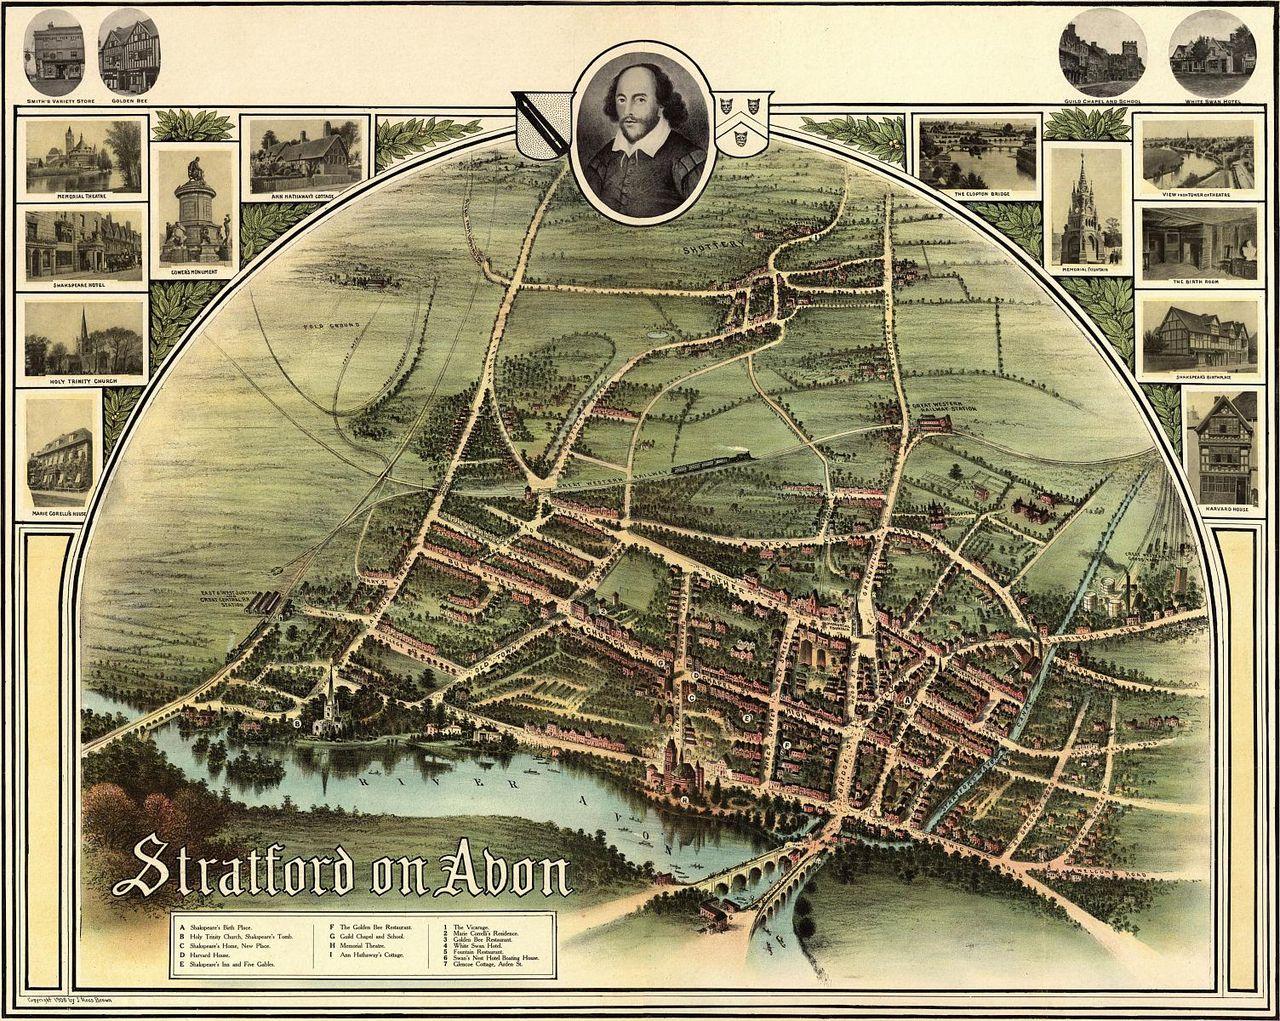 FileStratford On Avon Historic Map Jpg Wikimedia Commons - Historic maps england